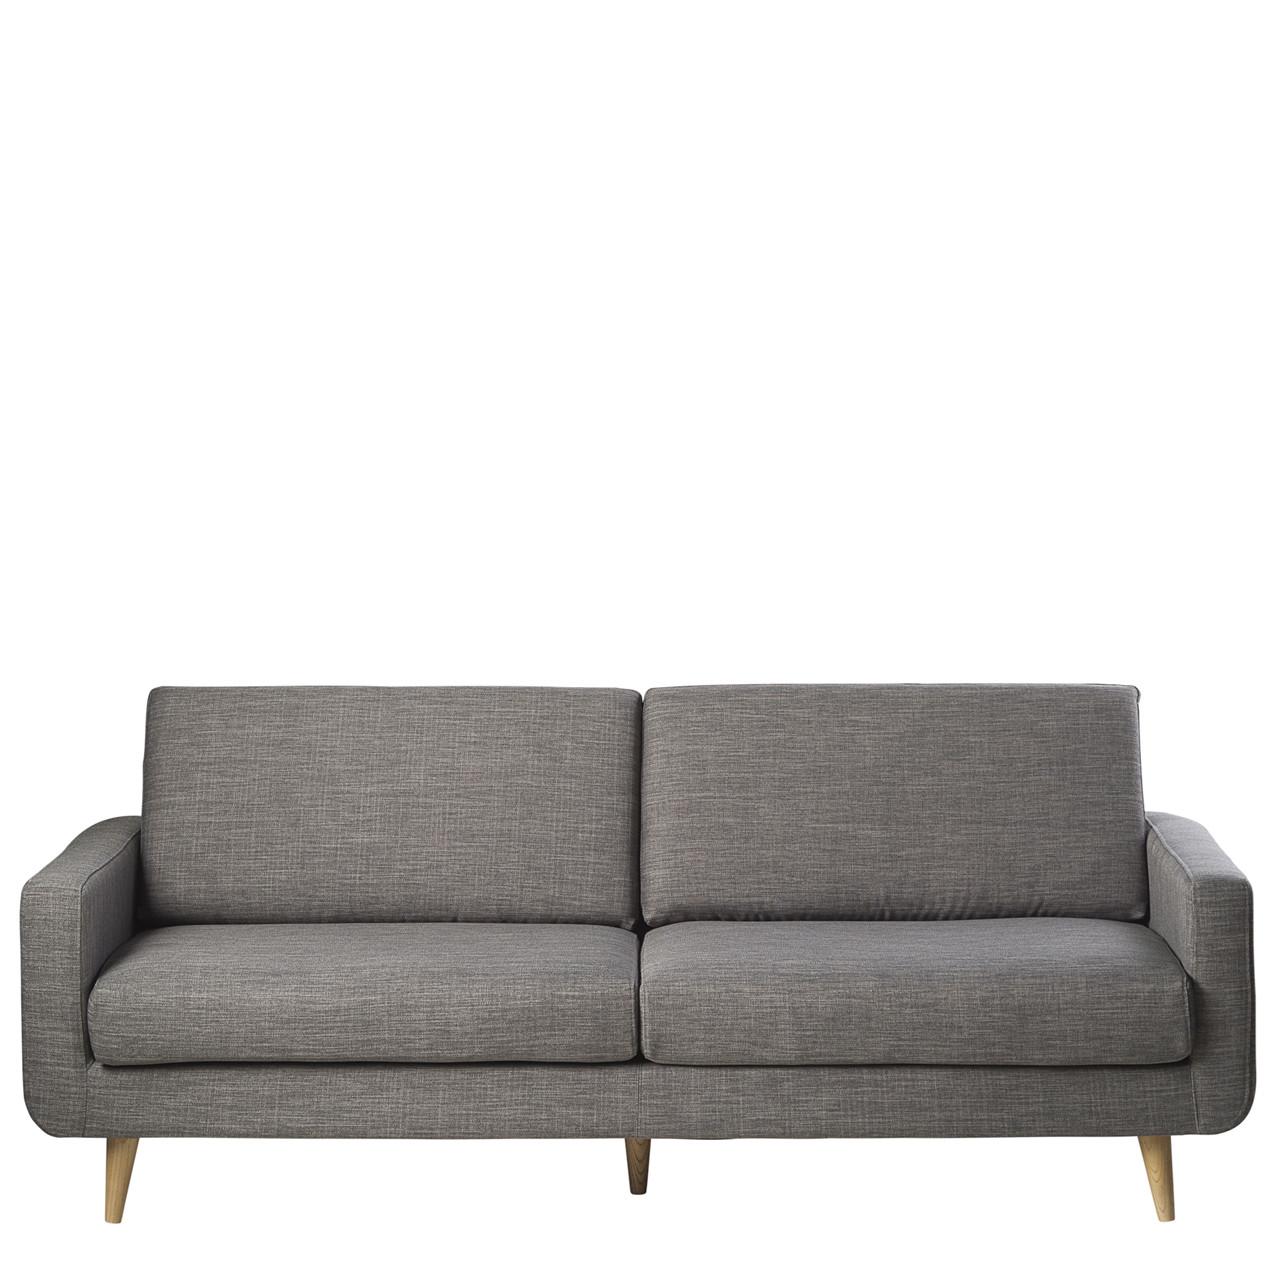 sofa grå FLORIDA sofa grå » Køb her sofa grå